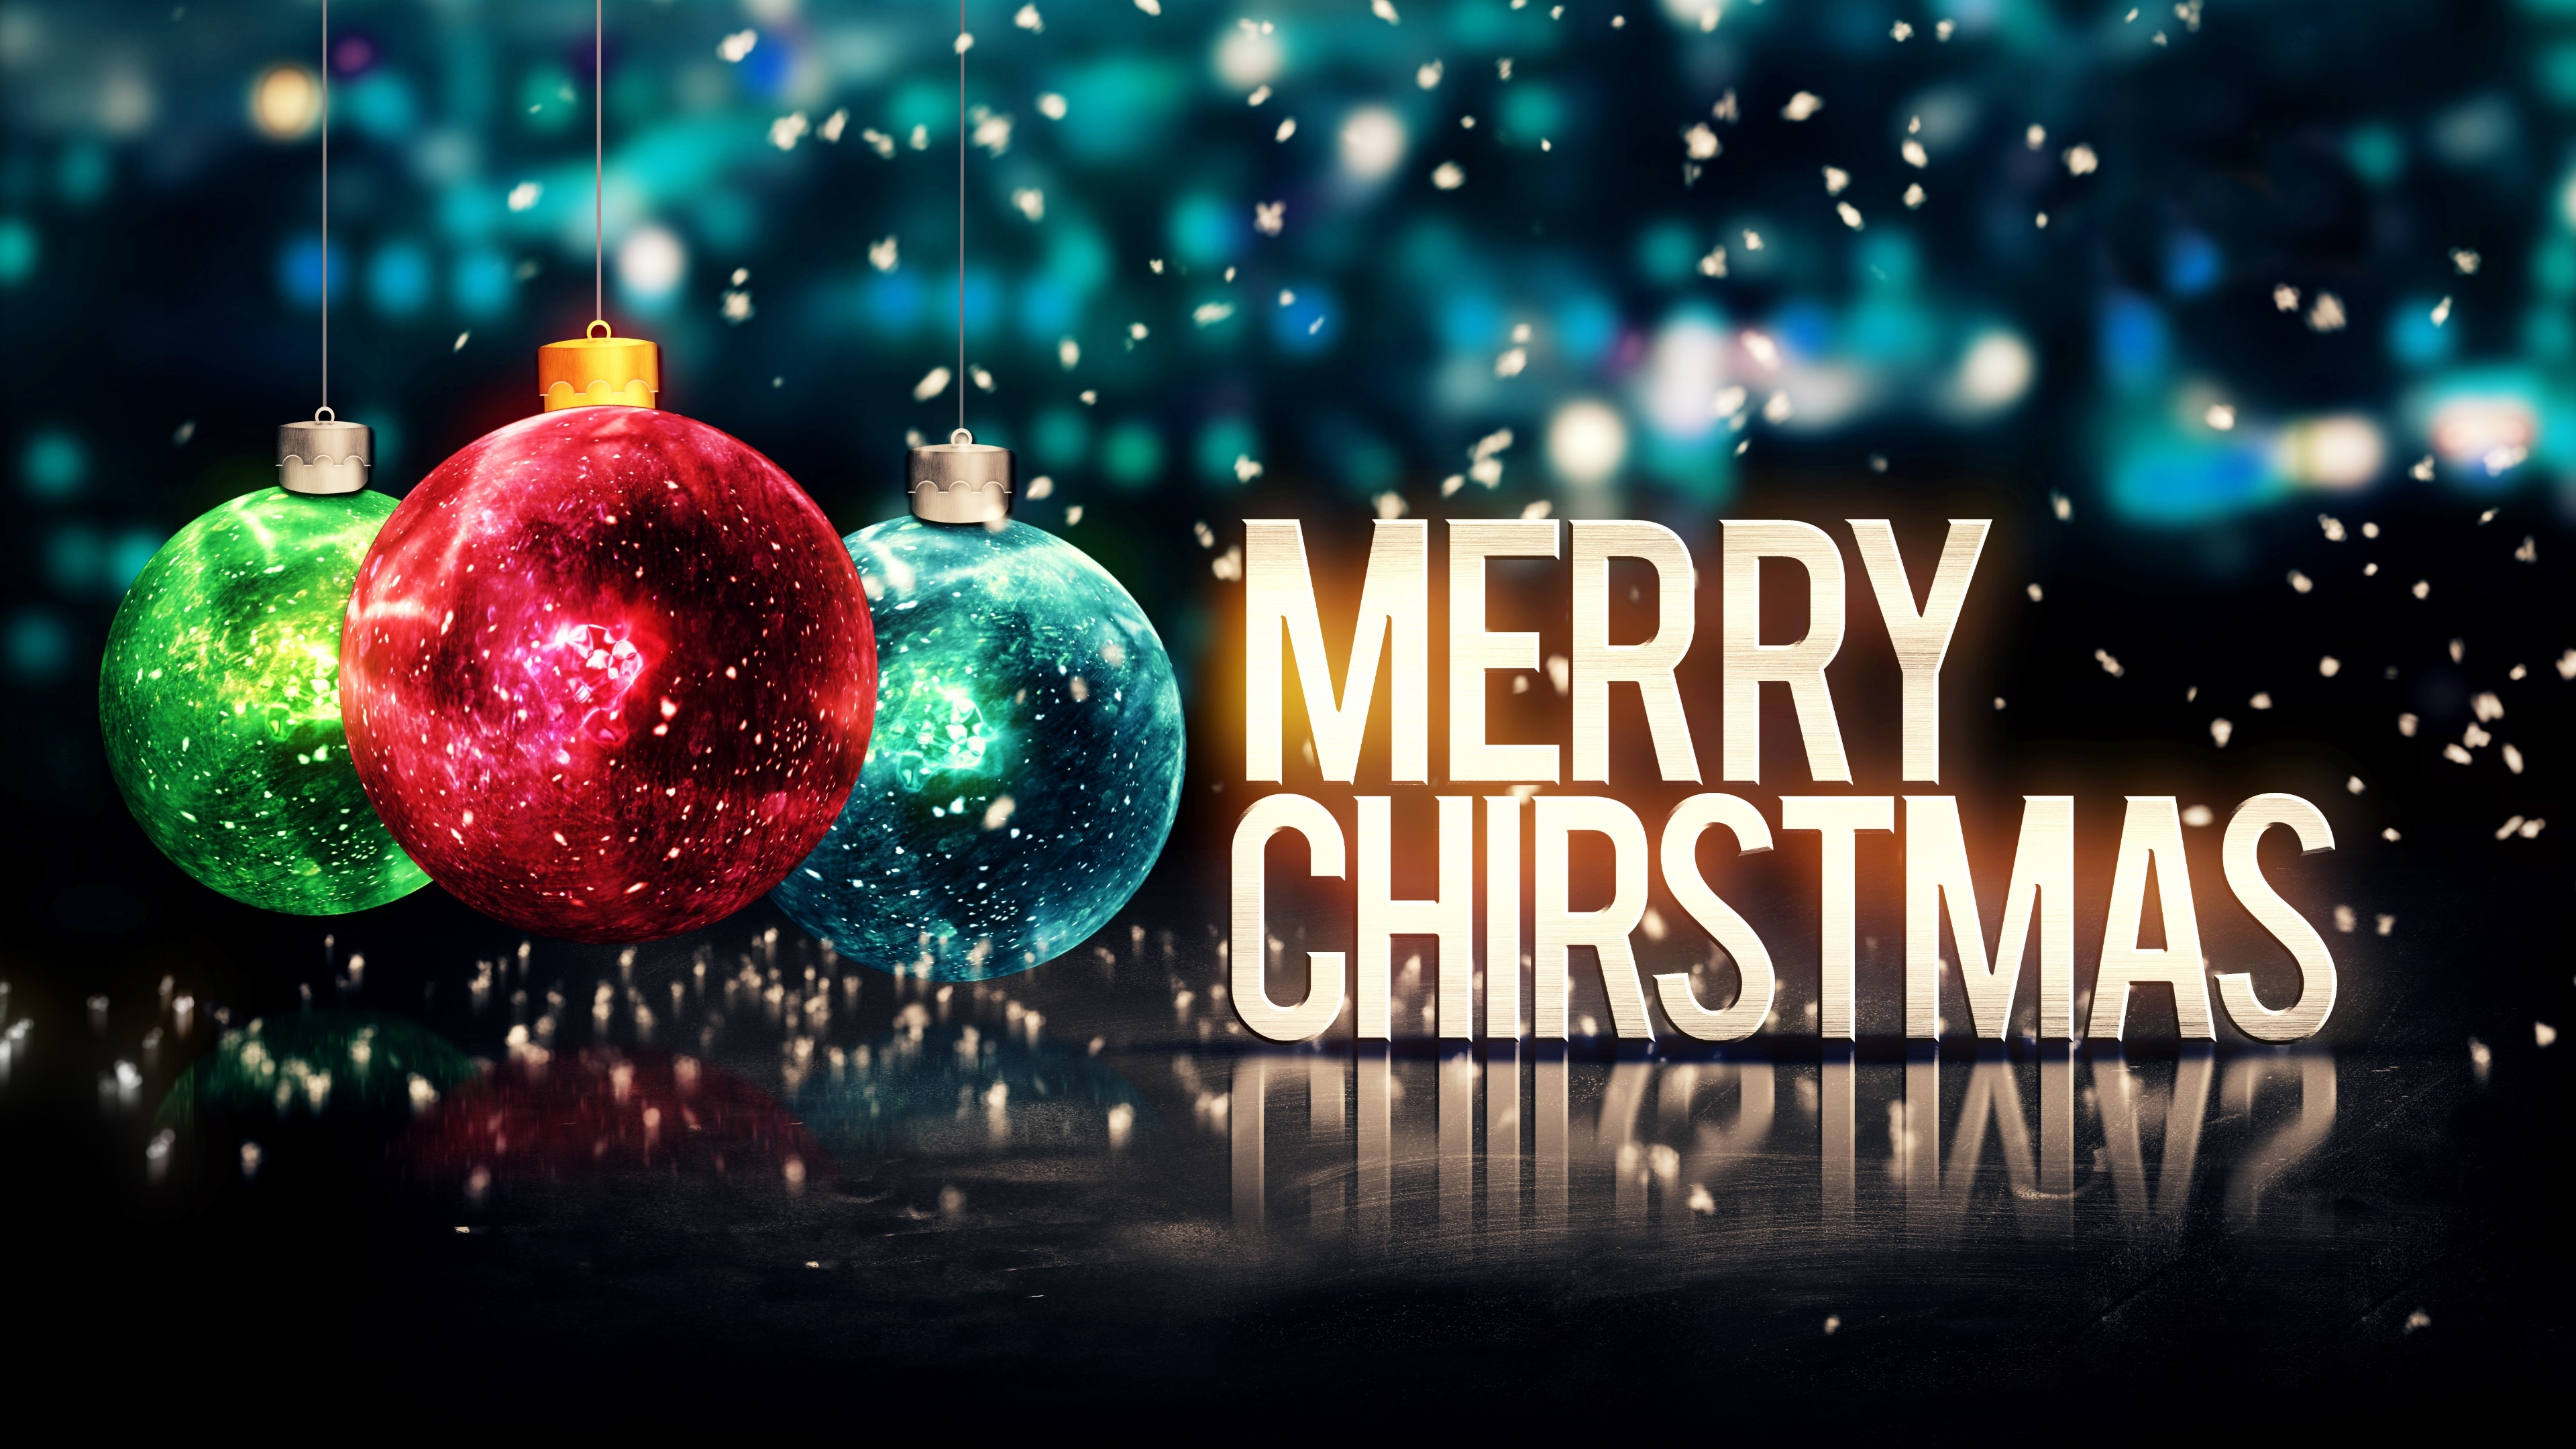 CHRISTMAS CELEBRATION: 3 DECEMBER 2017